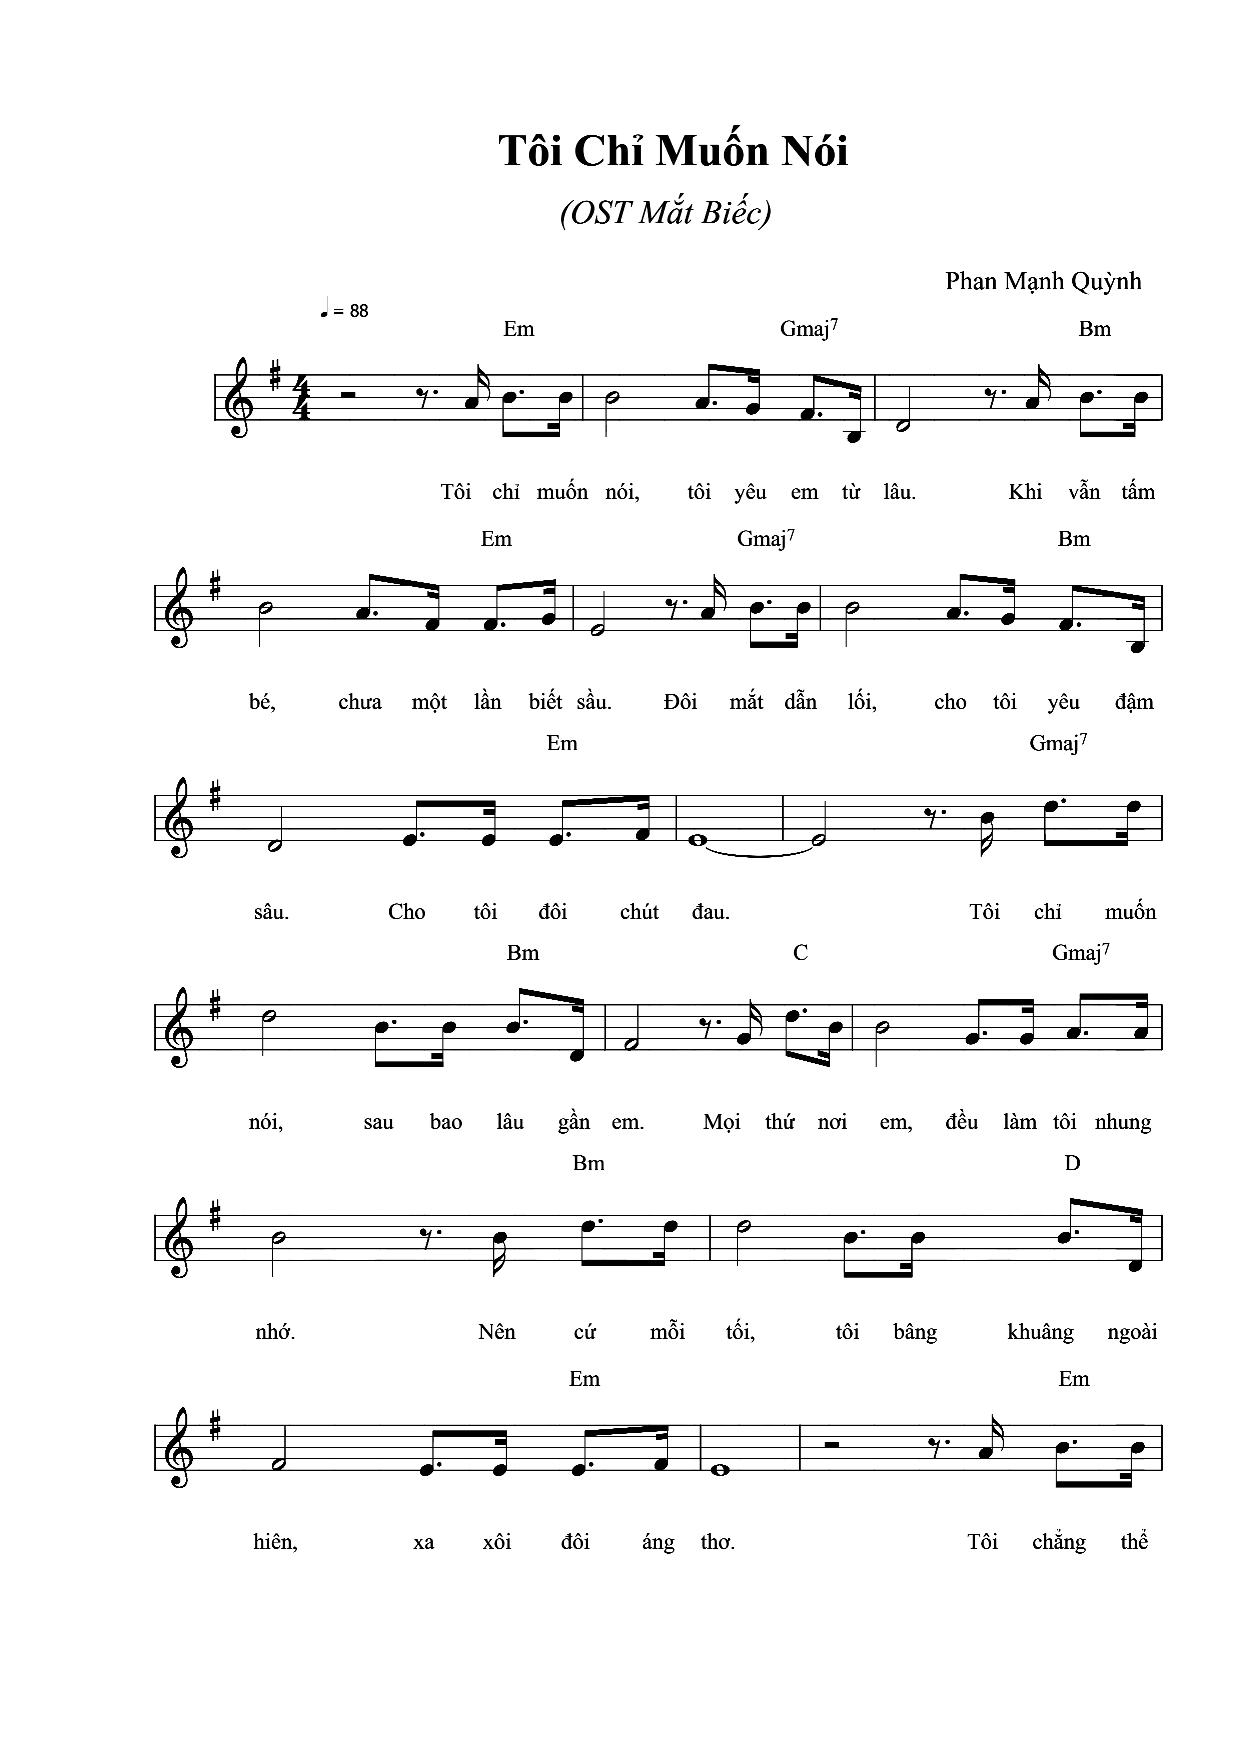 Sheet nhac Toi chi muon noi -OST Mat biec-Em_001.png